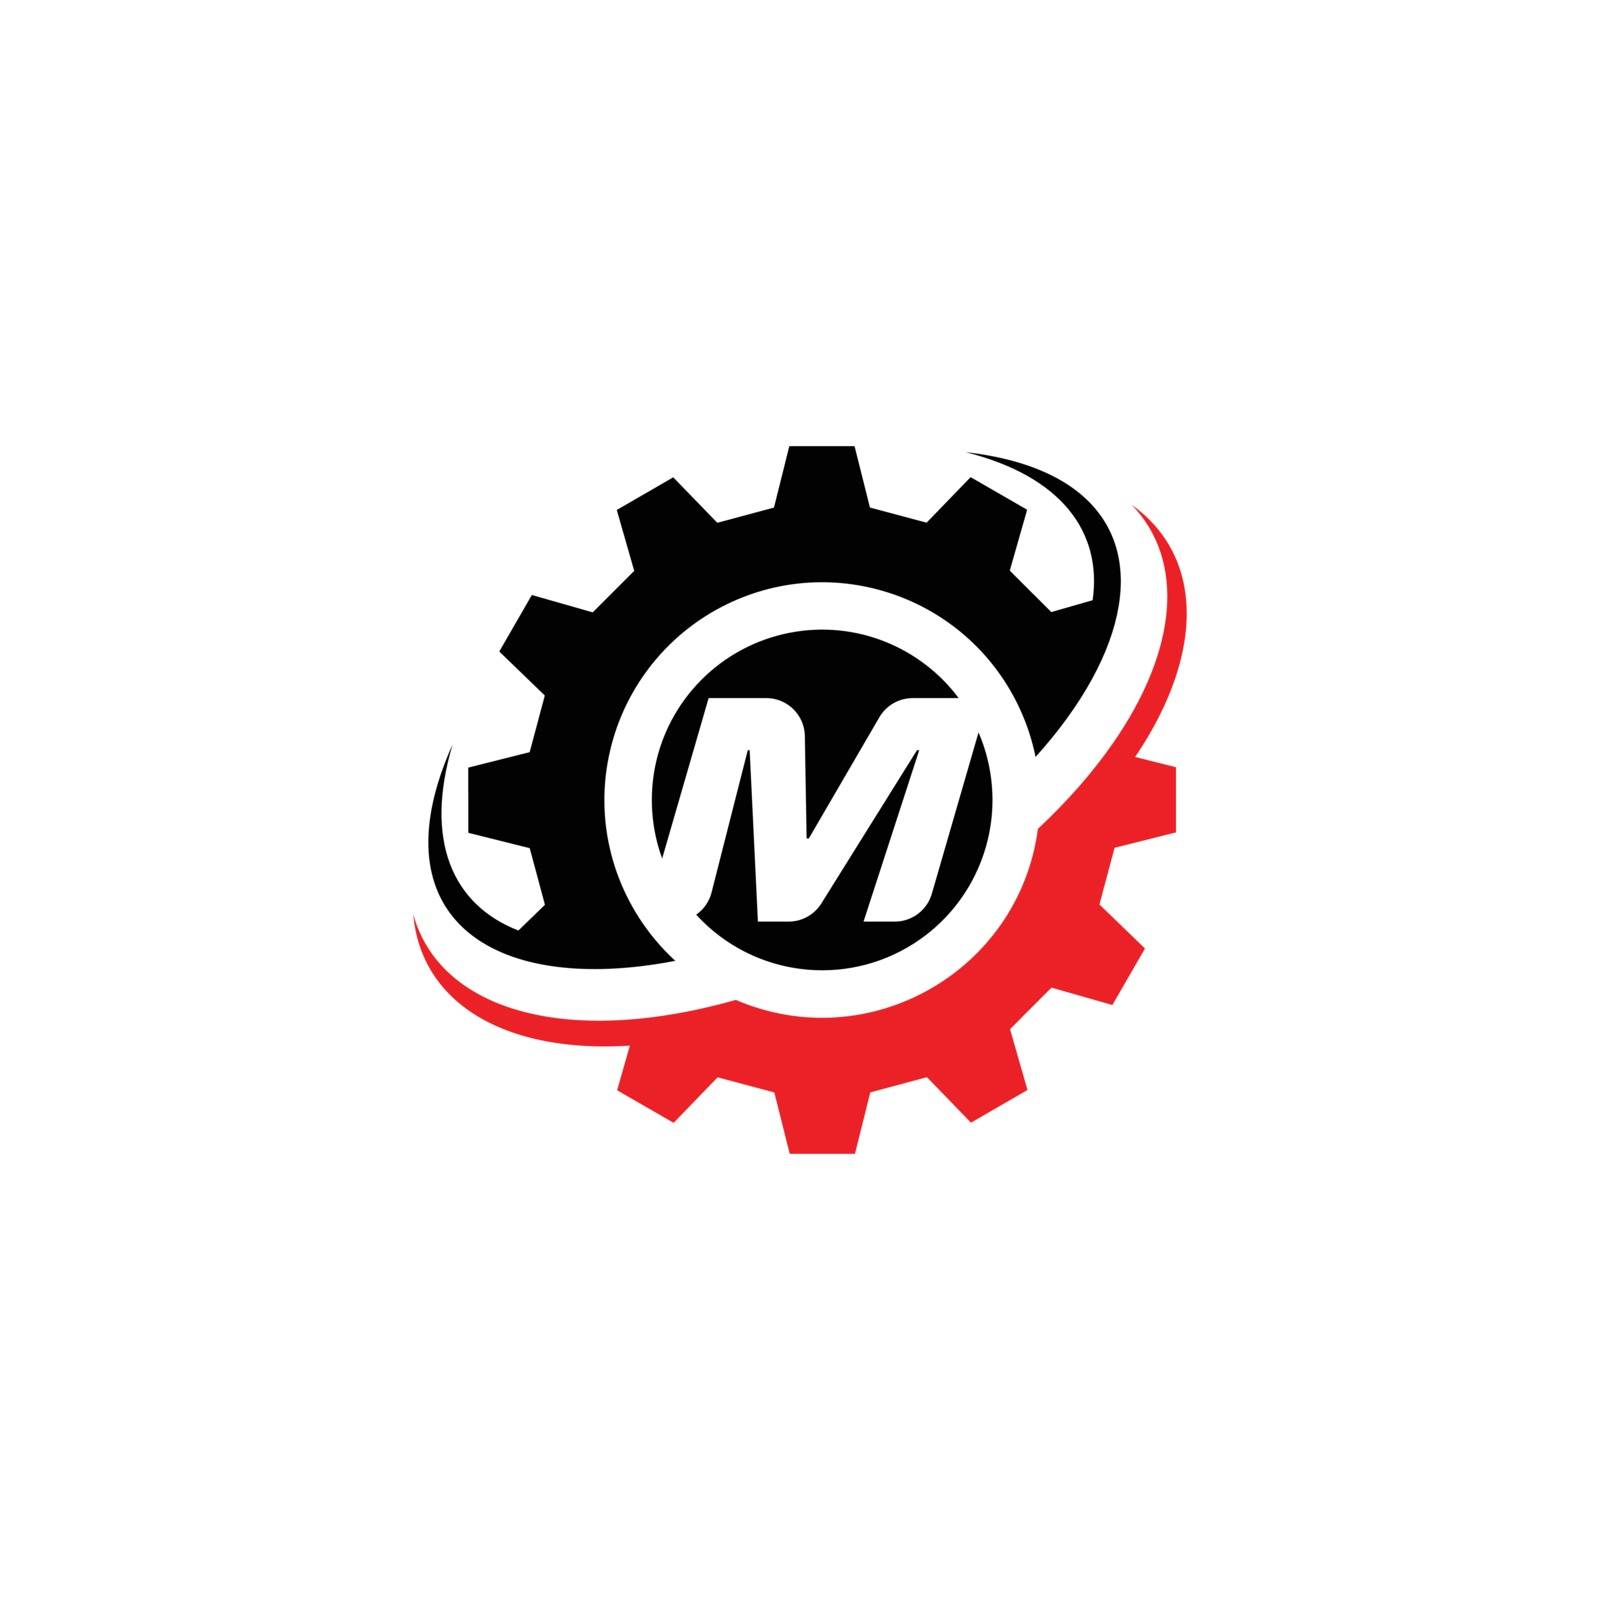 Letter M Gear Logo Design Template